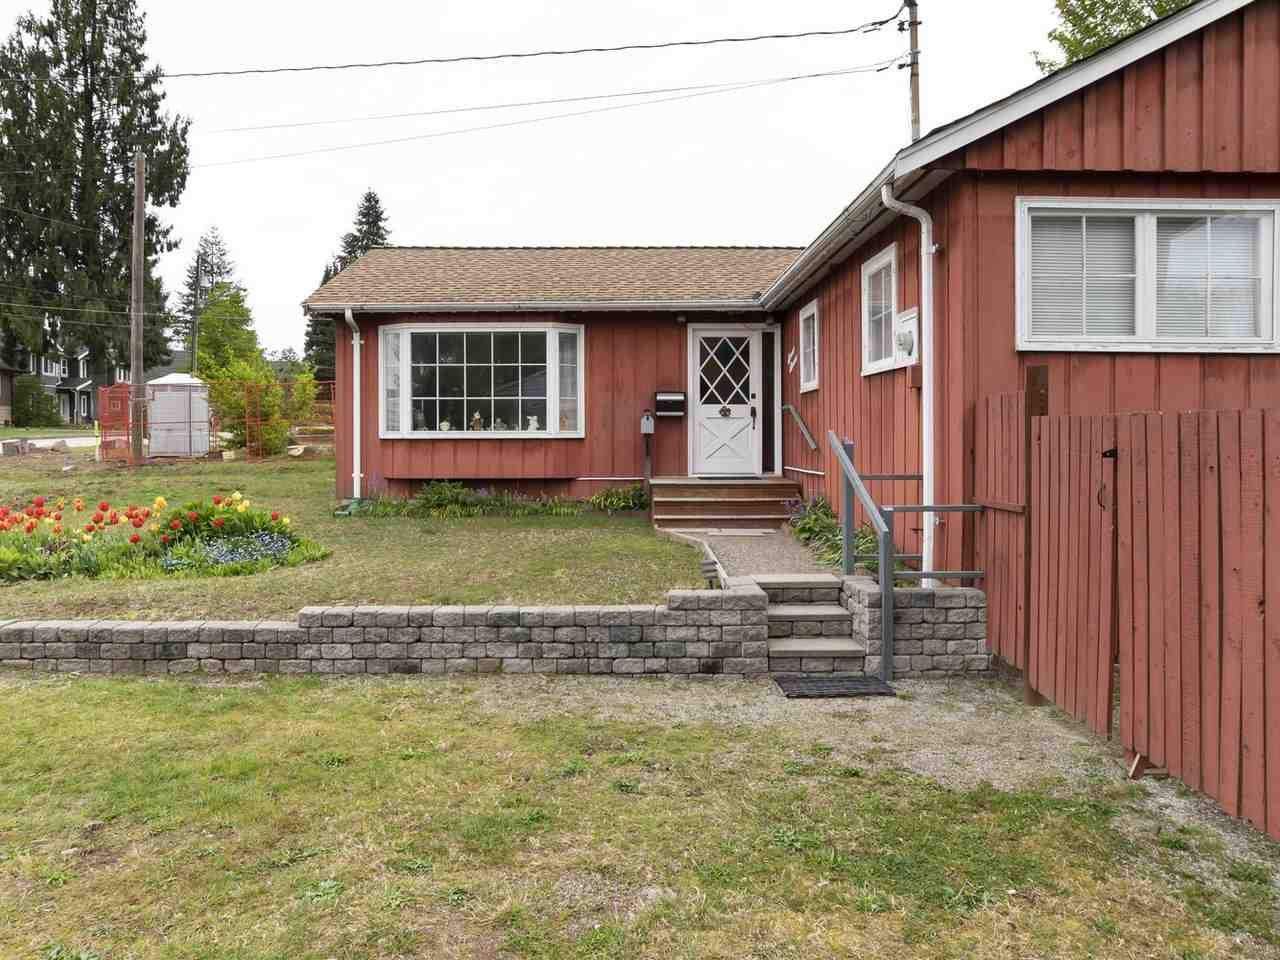 Photo 3: Photos: 1111 REGAN Avenue in Coquitlam: Central Coquitlam House for sale : MLS®# R2452577